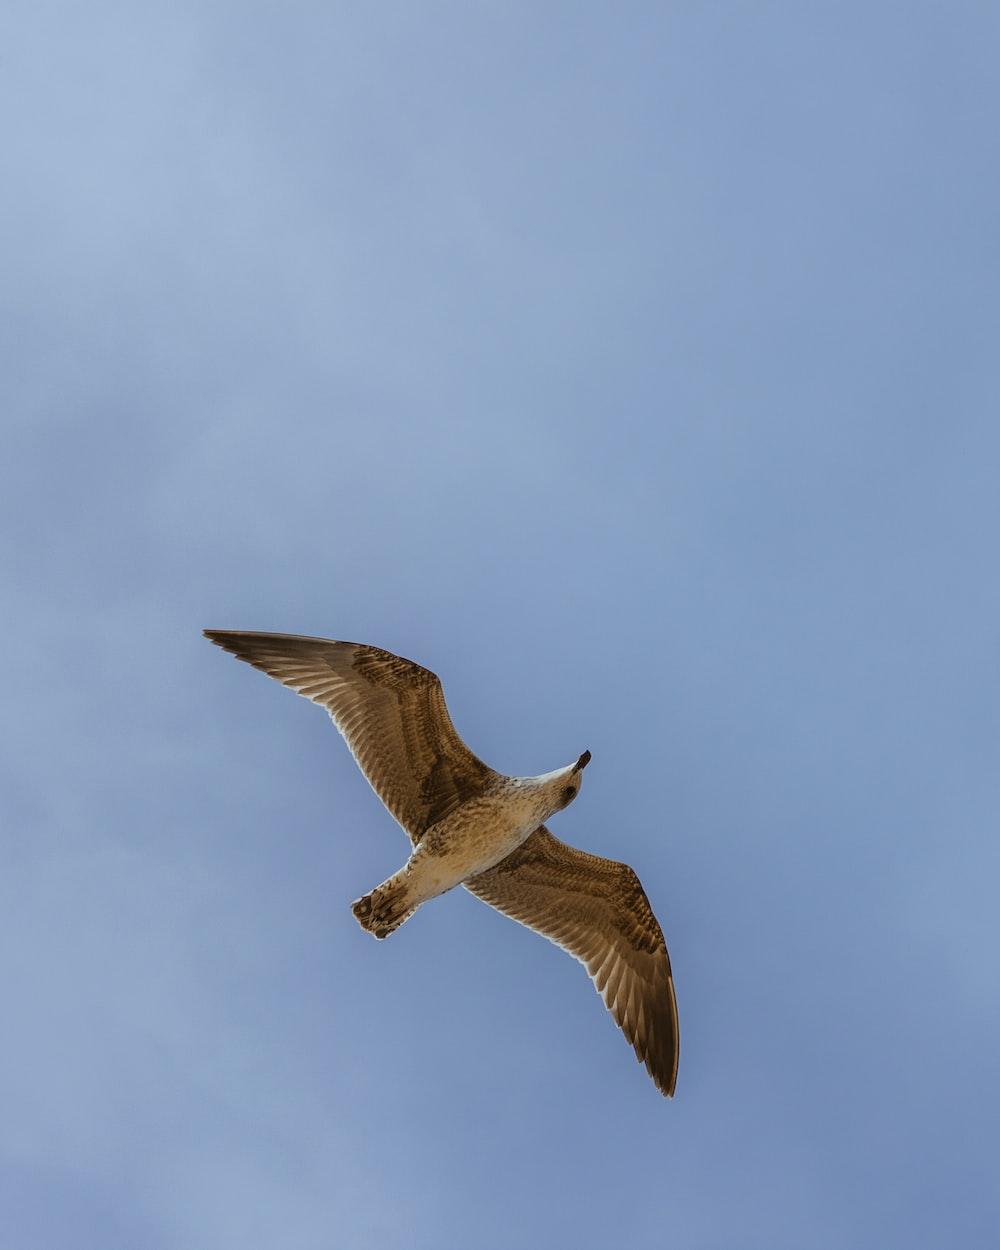 brown bird in flight under blue sky